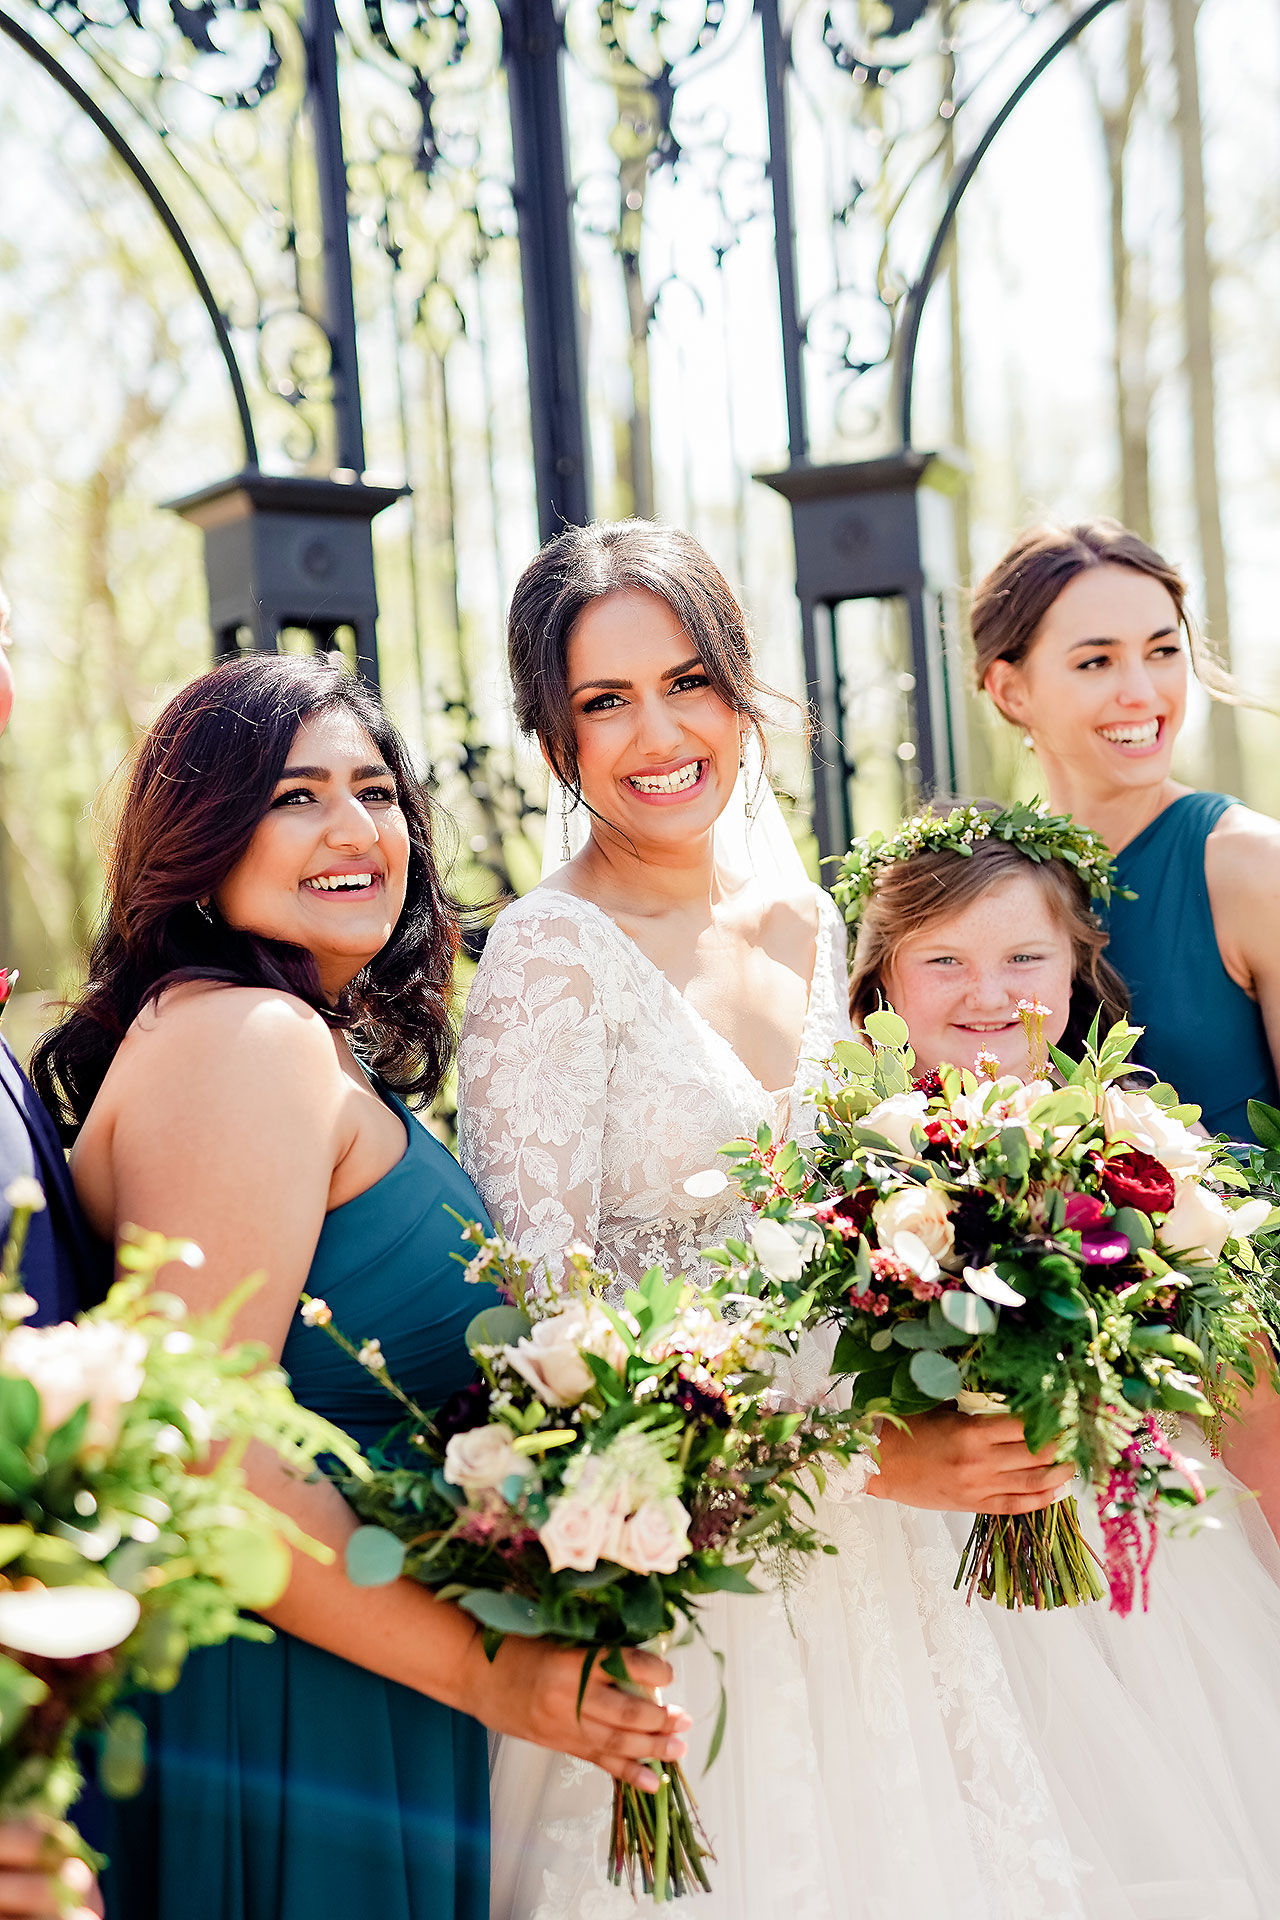 Nadia Parker Black Iris Estate Carmel Indiana Wedding May 2021 104